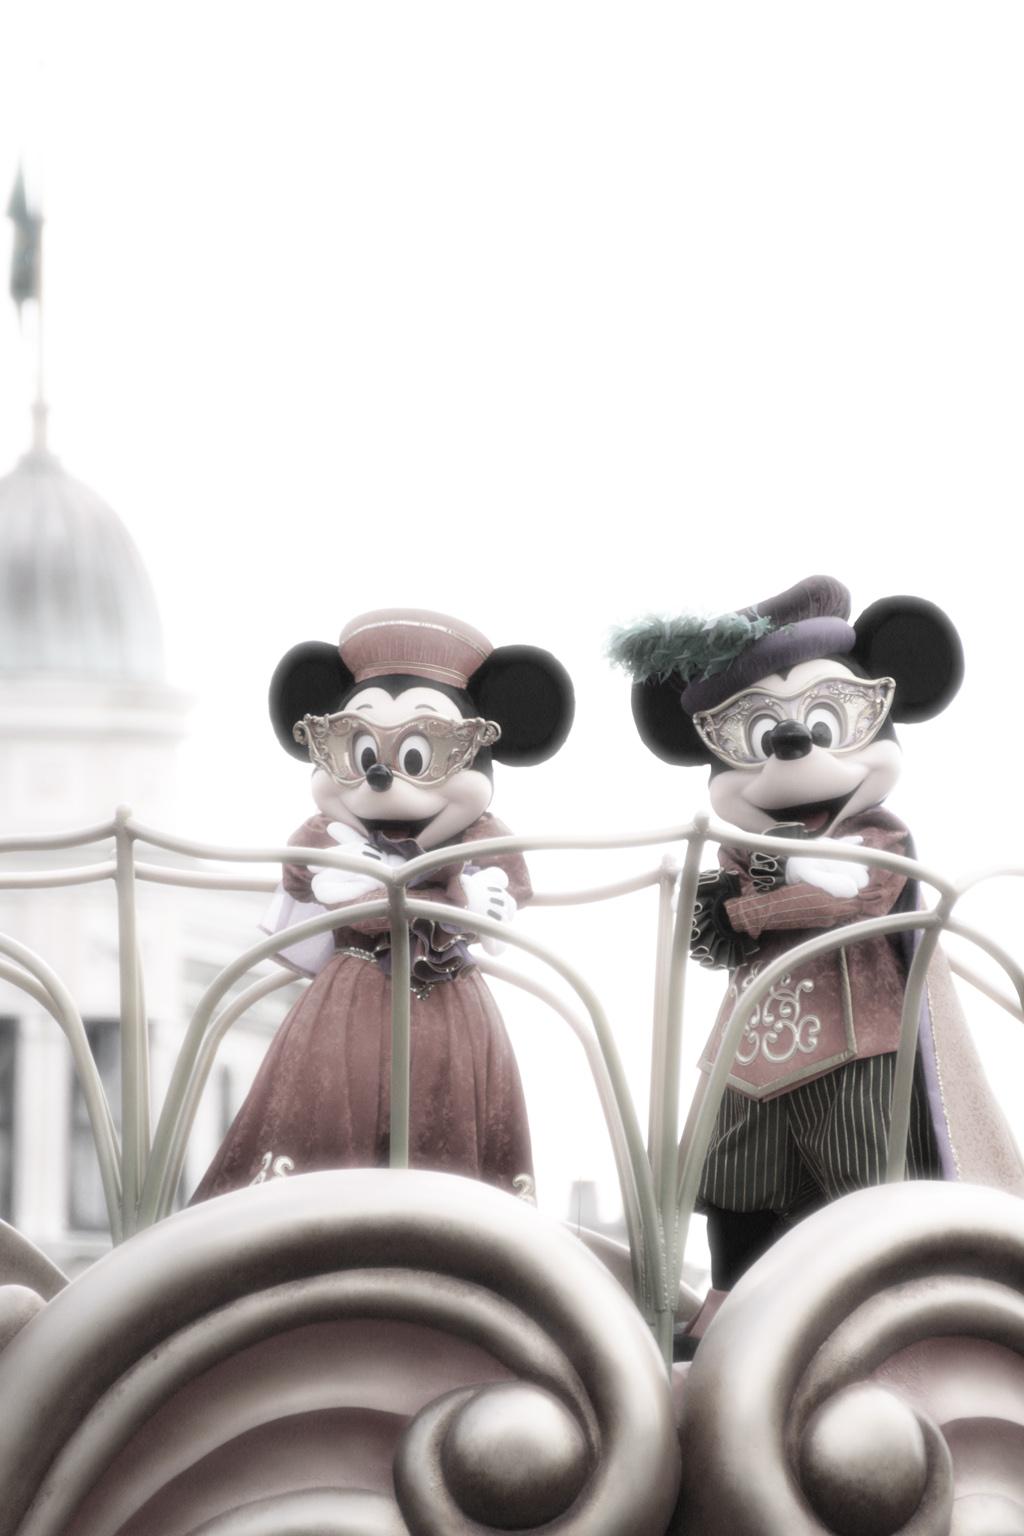 Mr. and Mrs. duke(ハロウィーン・デイドリーム)